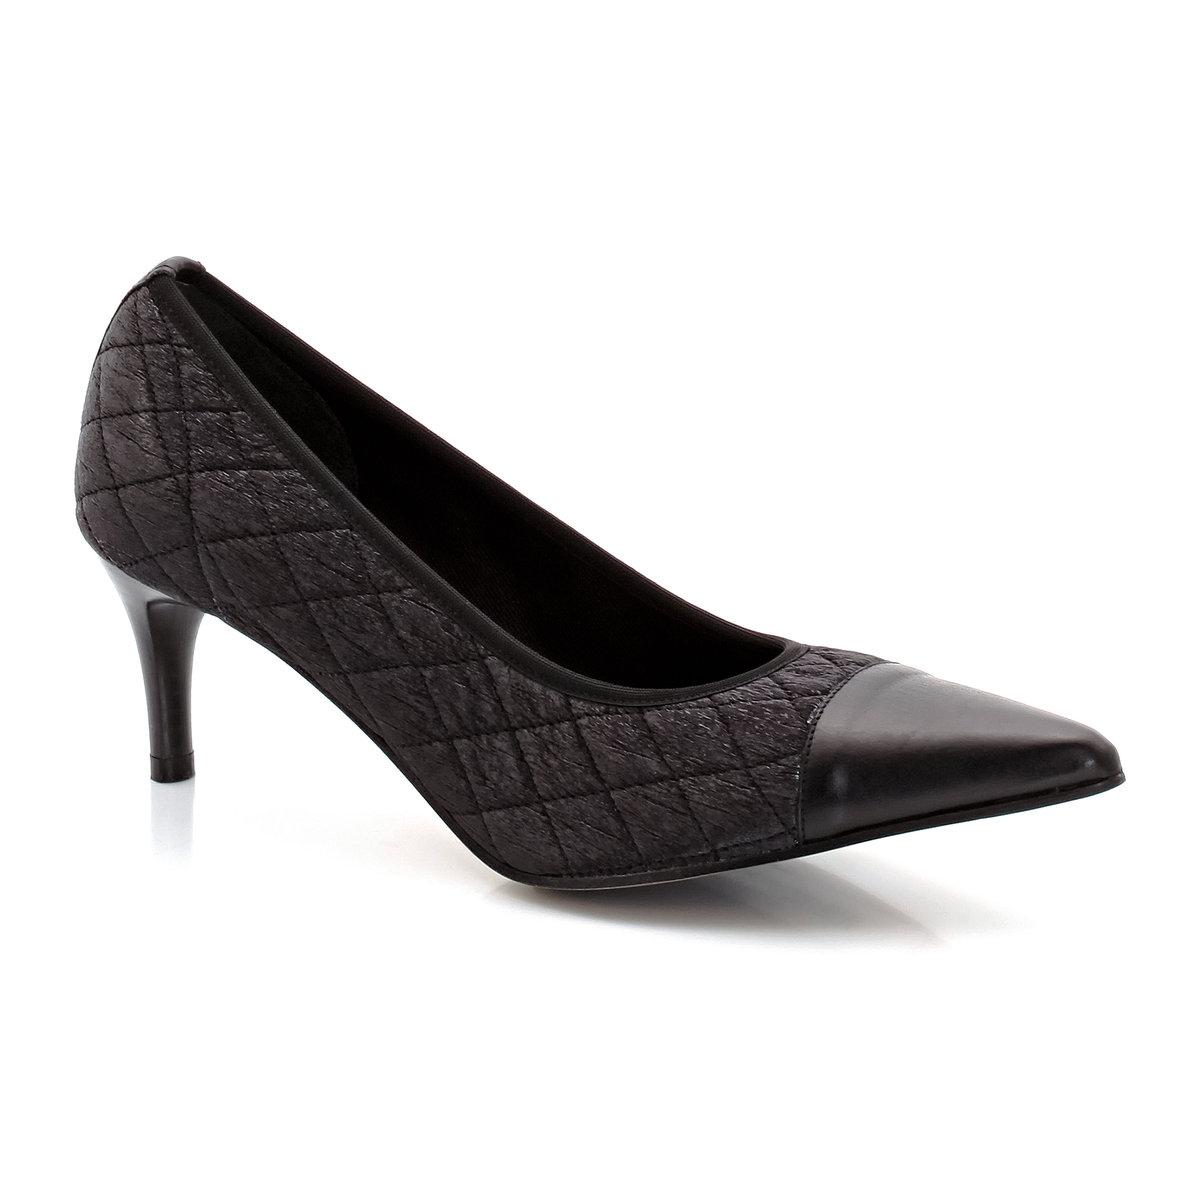 Sapatos RAYAN dELIZABETH STUART